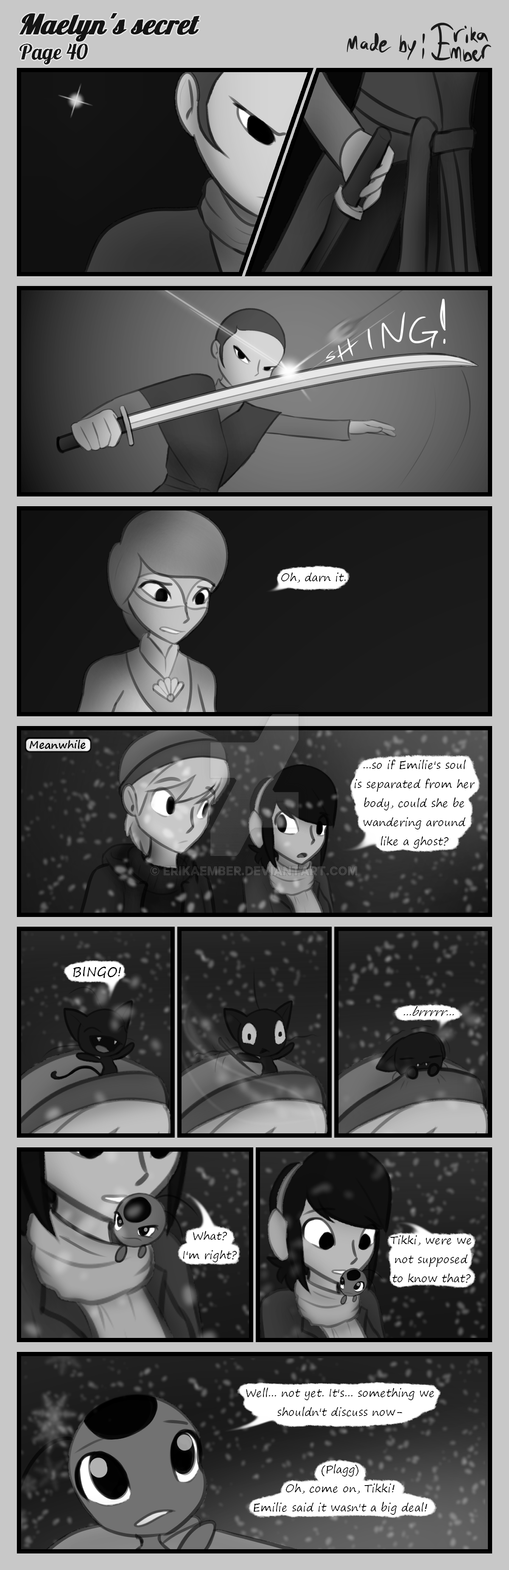 Maelyn's Secret - Page 40